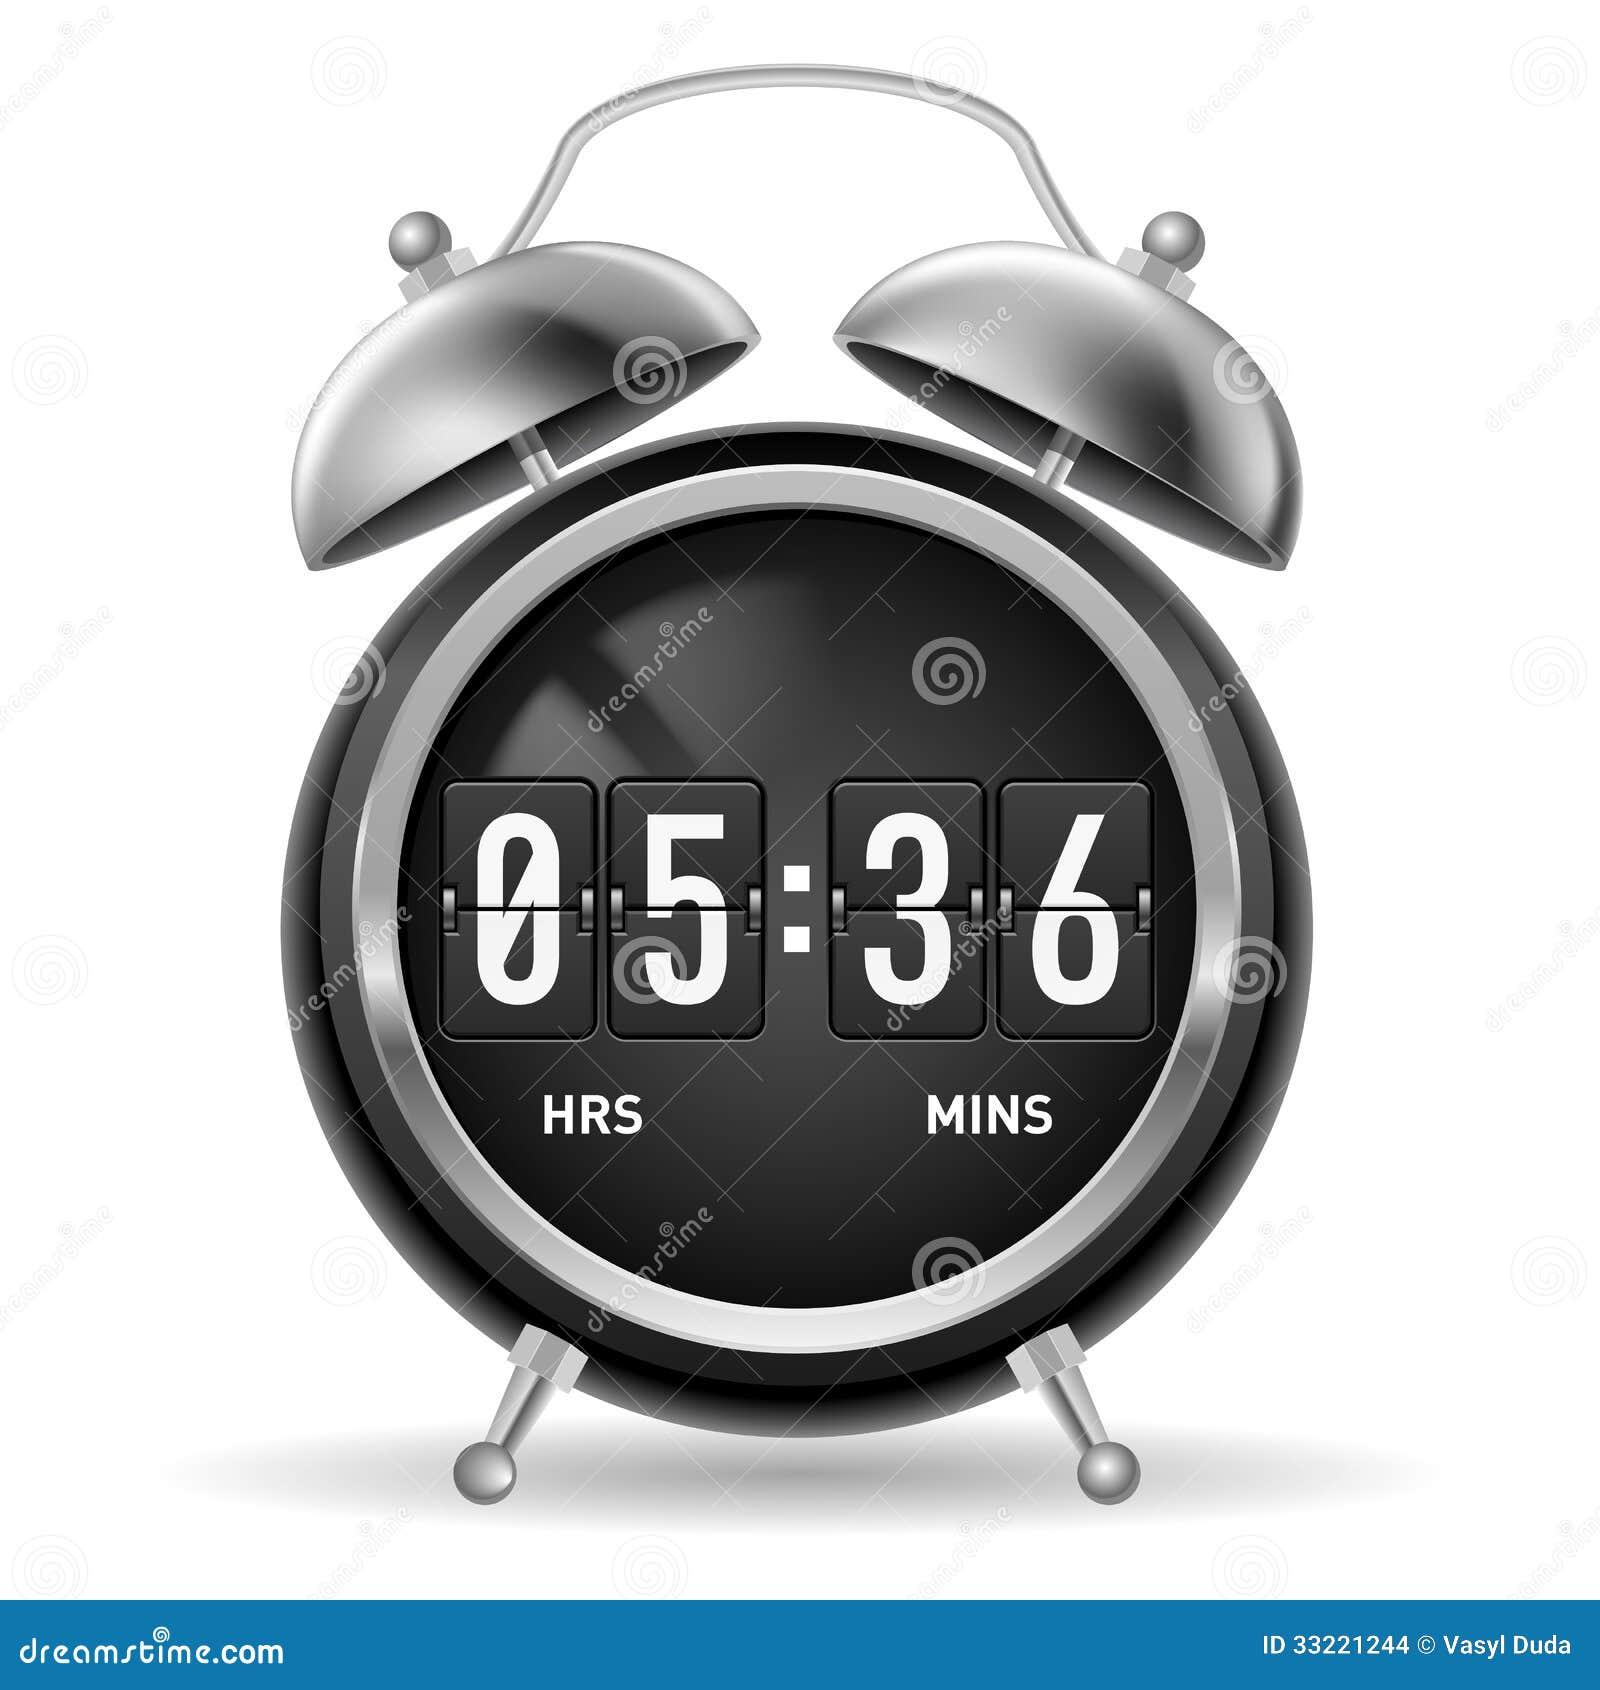 retro flip alarm clock stock illustration image of design 33221244. Black Bedroom Furniture Sets. Home Design Ideas